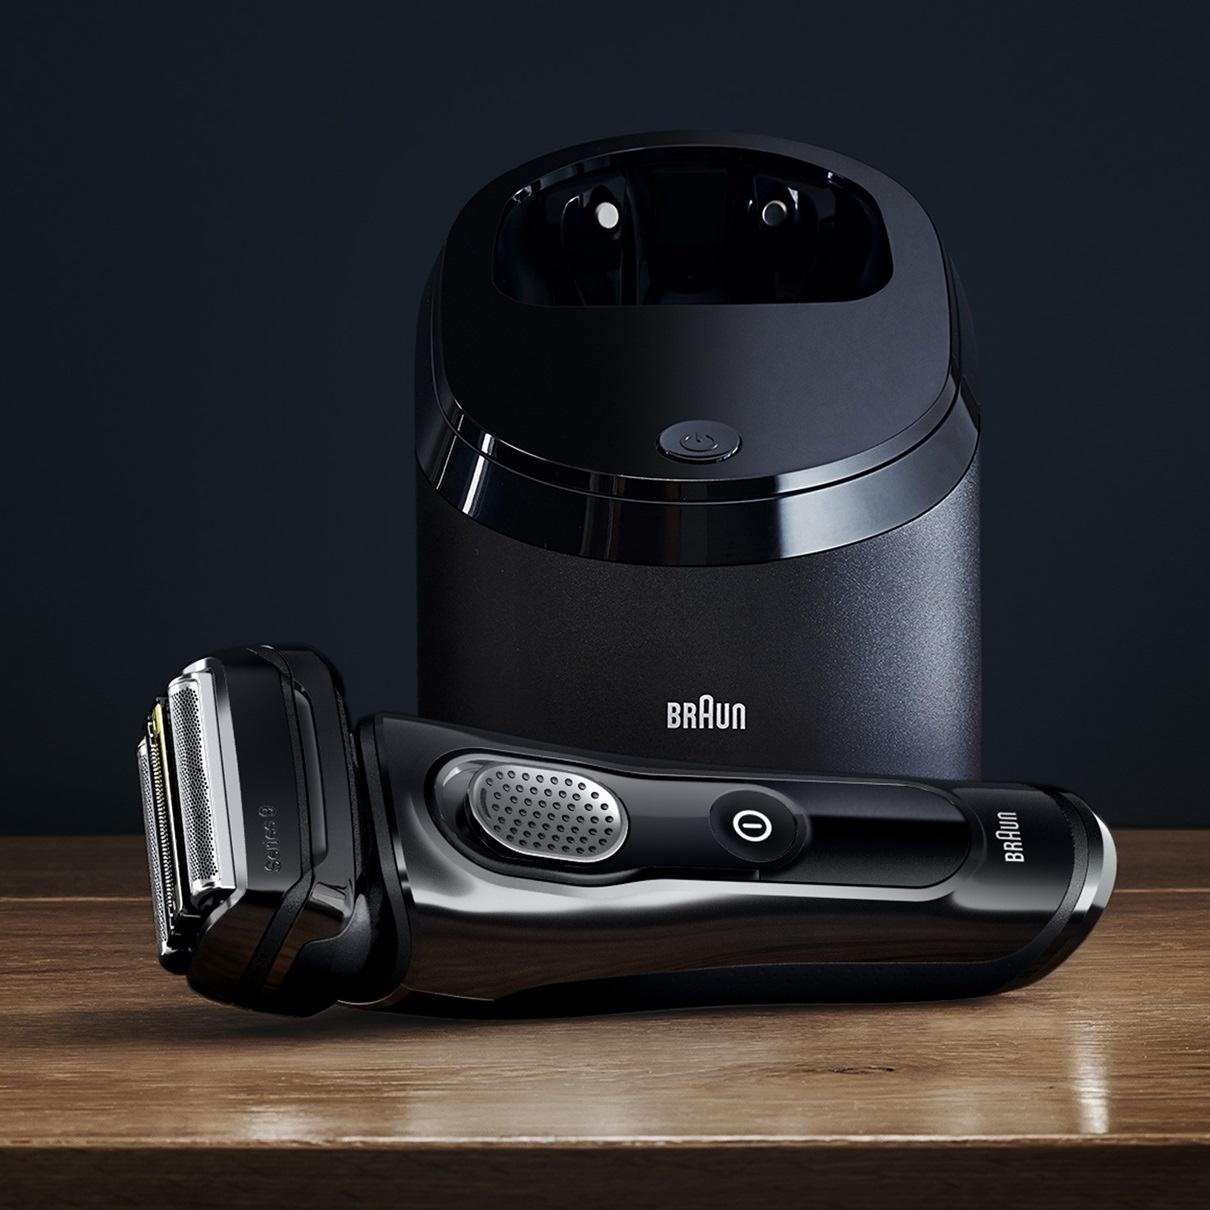 braun 9250cc series 9 elektrorasierer clean charge. Black Bedroom Furniture Sets. Home Design Ideas